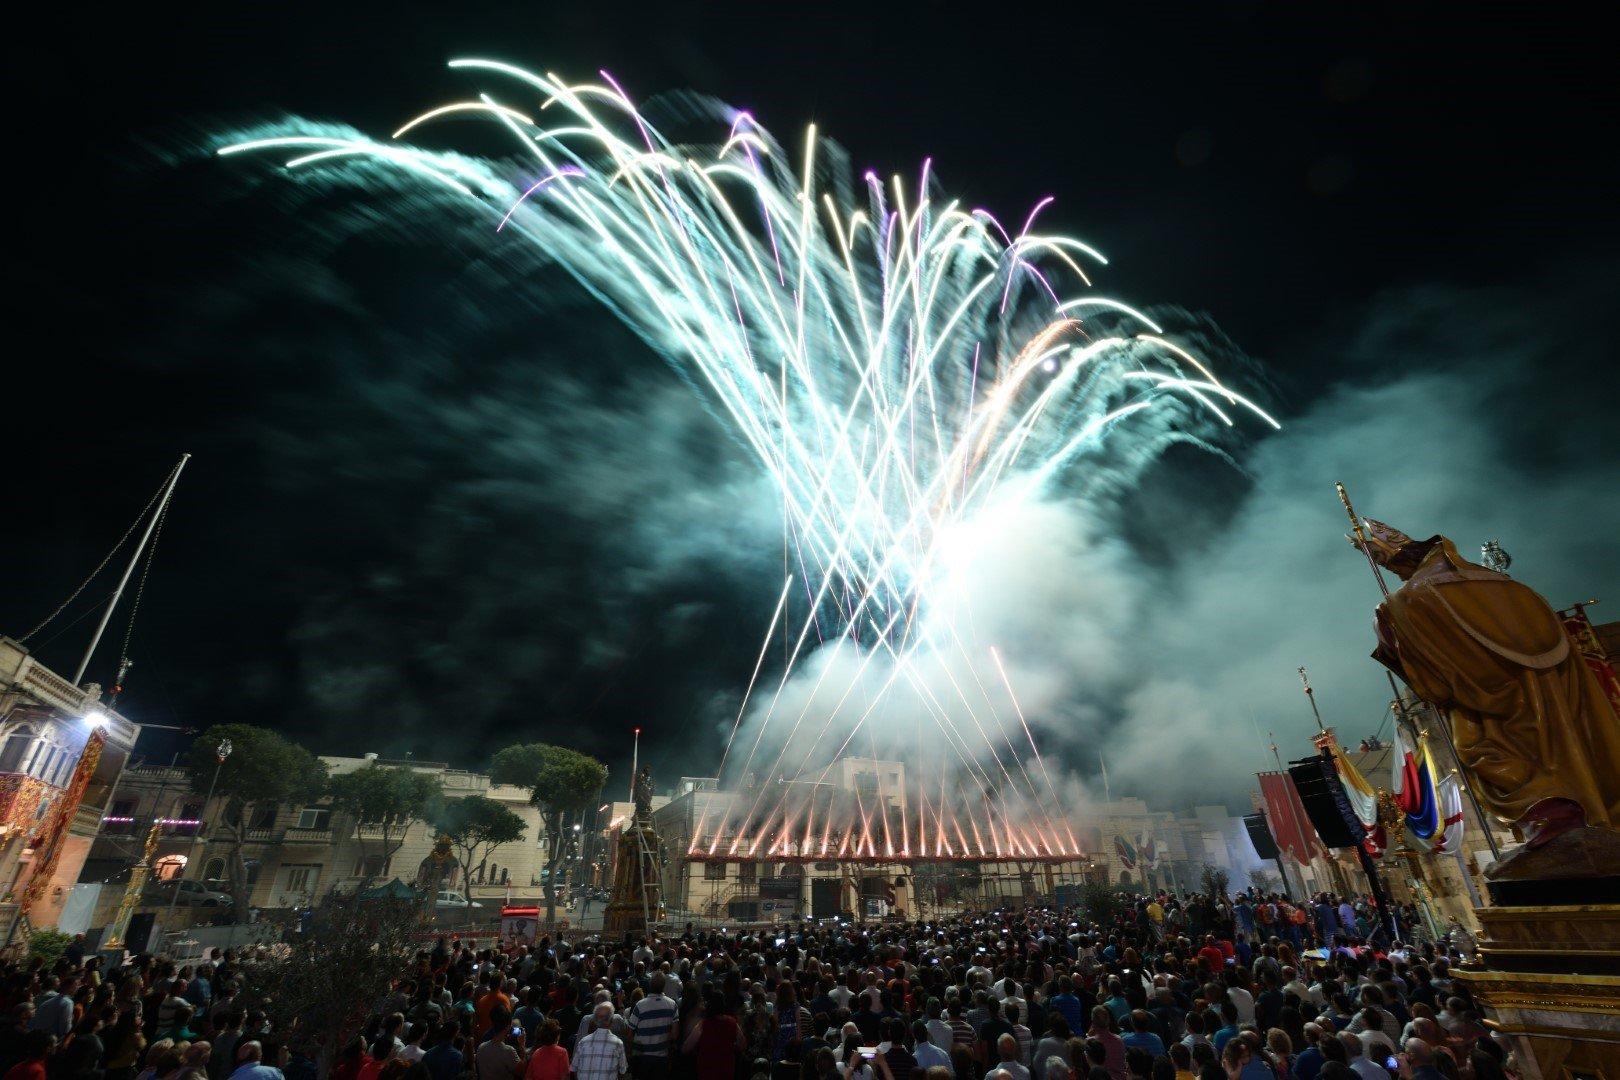 A fireworks display in Munxar, Gozo